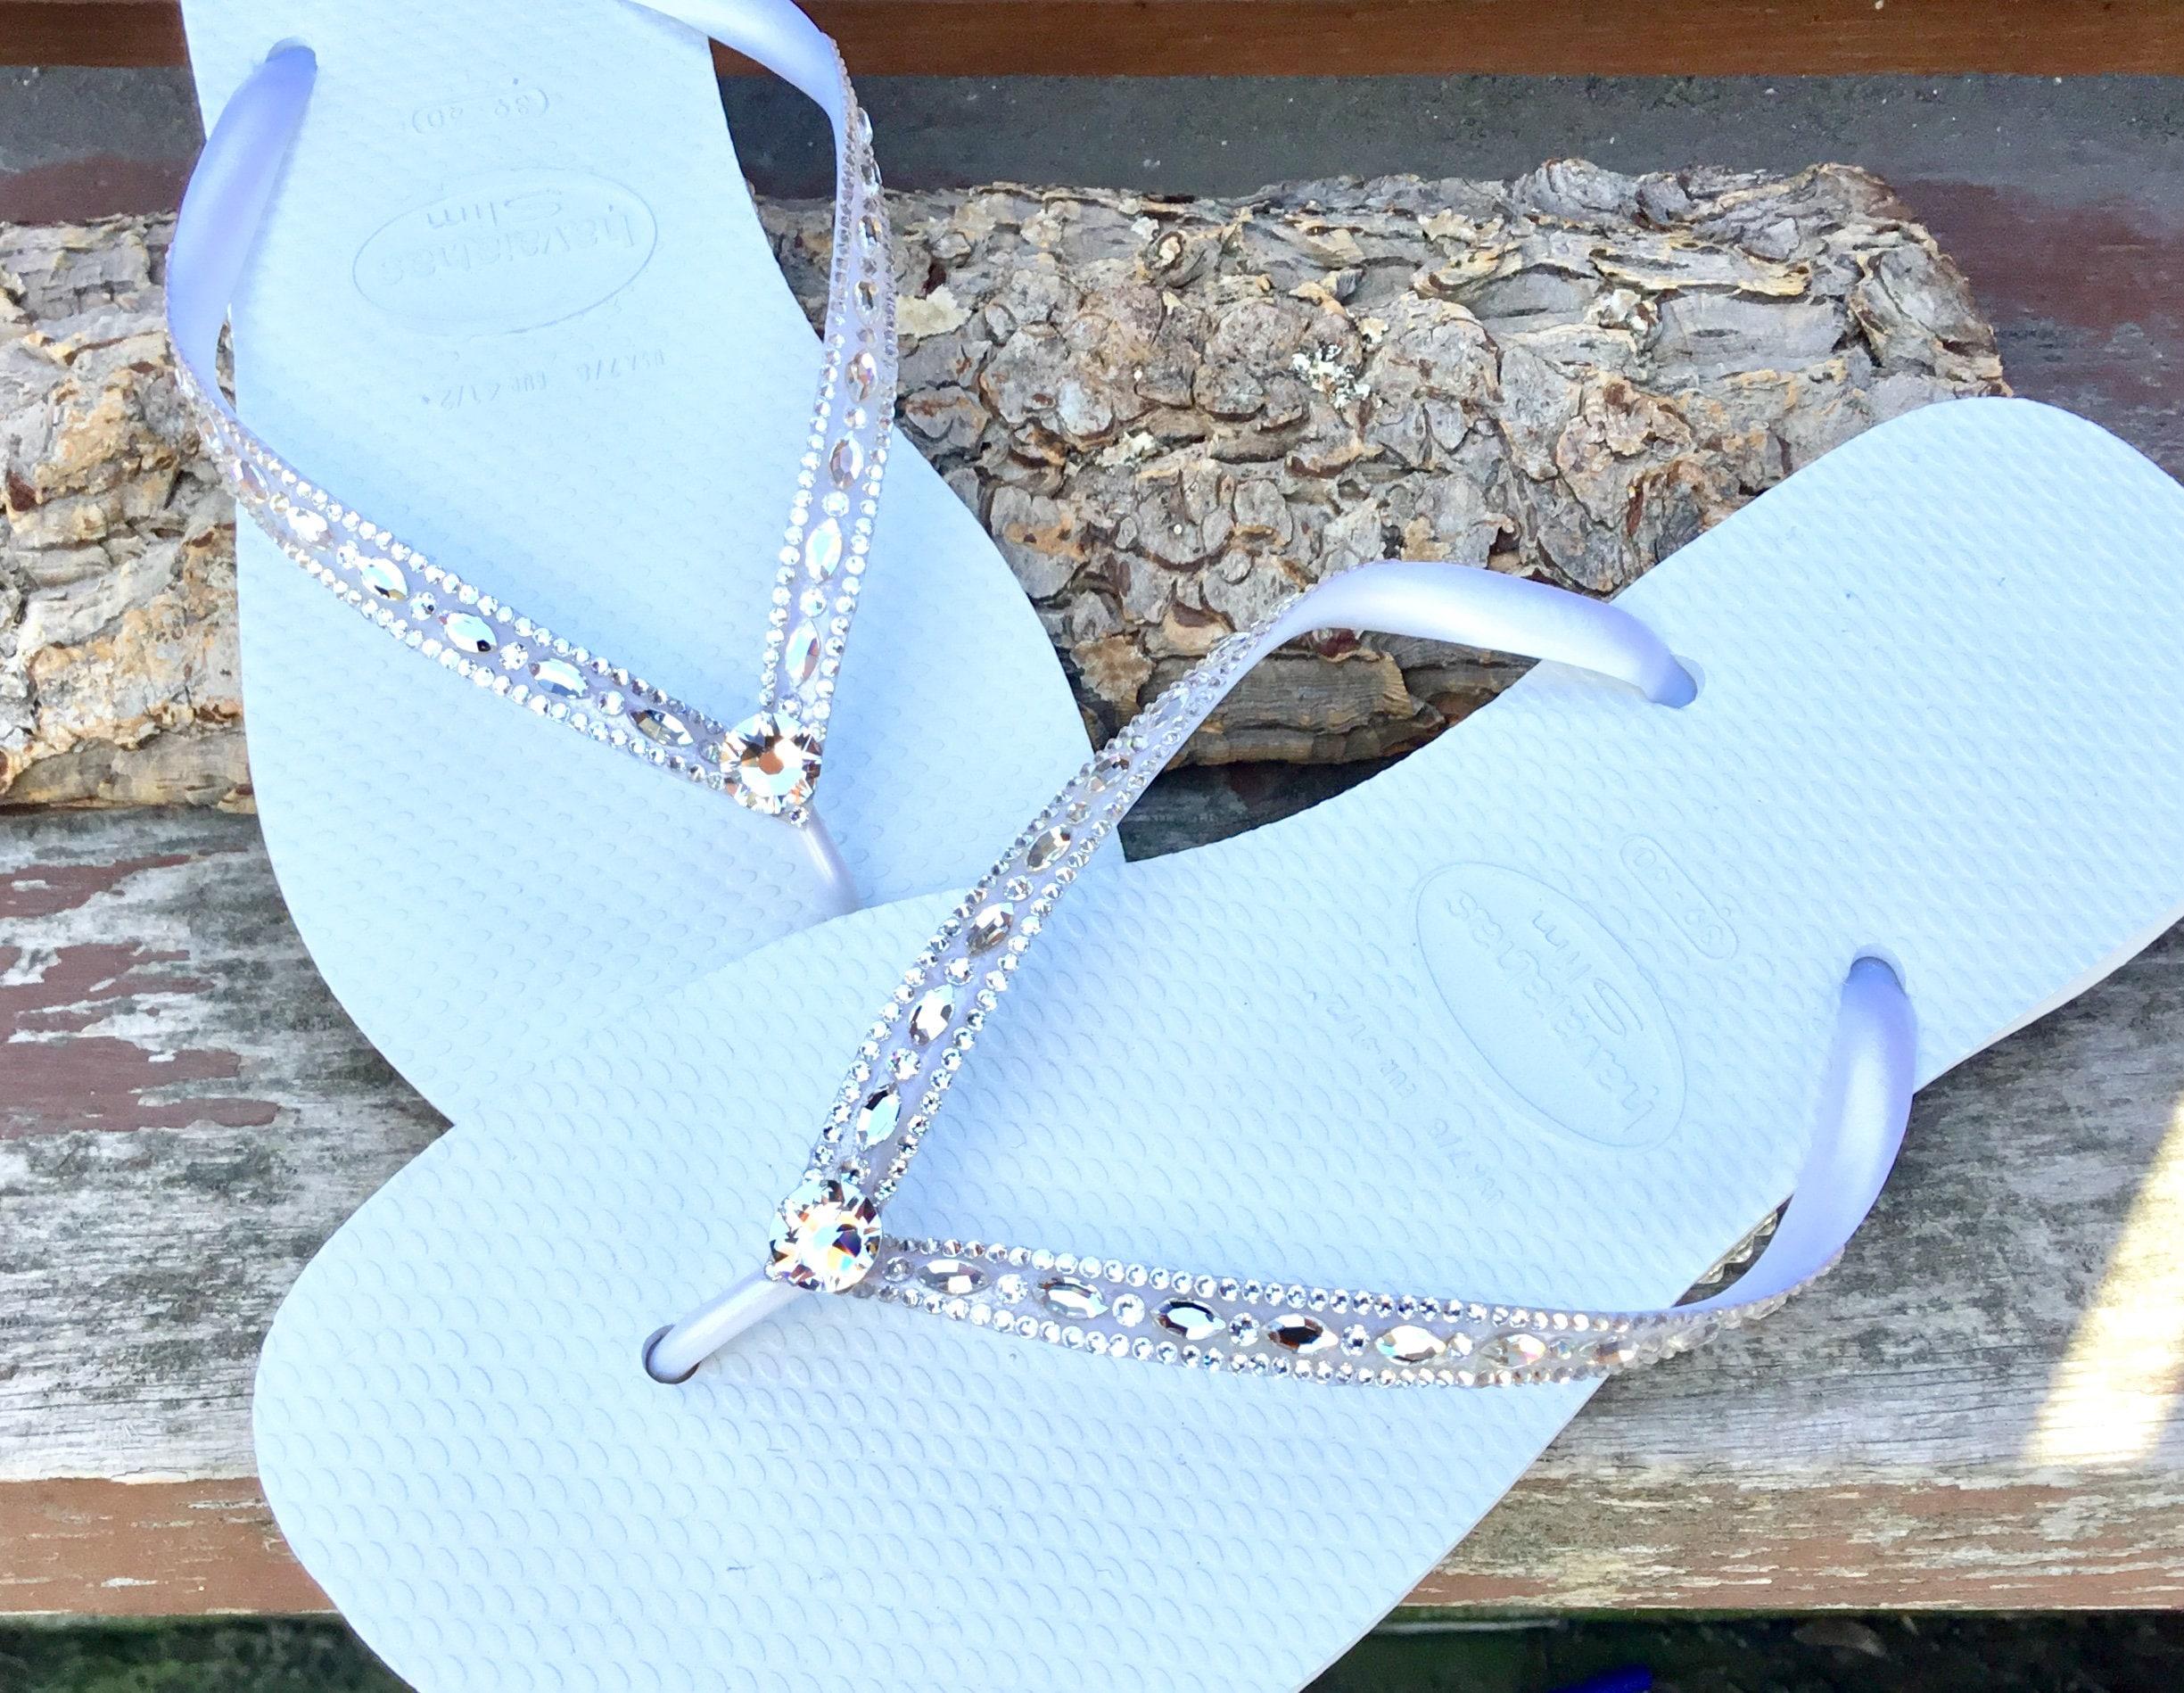 393bd123061b4 Havaianas Slim White Crystal Rhinestone Beach Wedding Flip Flops Blushing  Bride Custom w  Swarovski jewels Beach Bridal Bling Reception Shoe